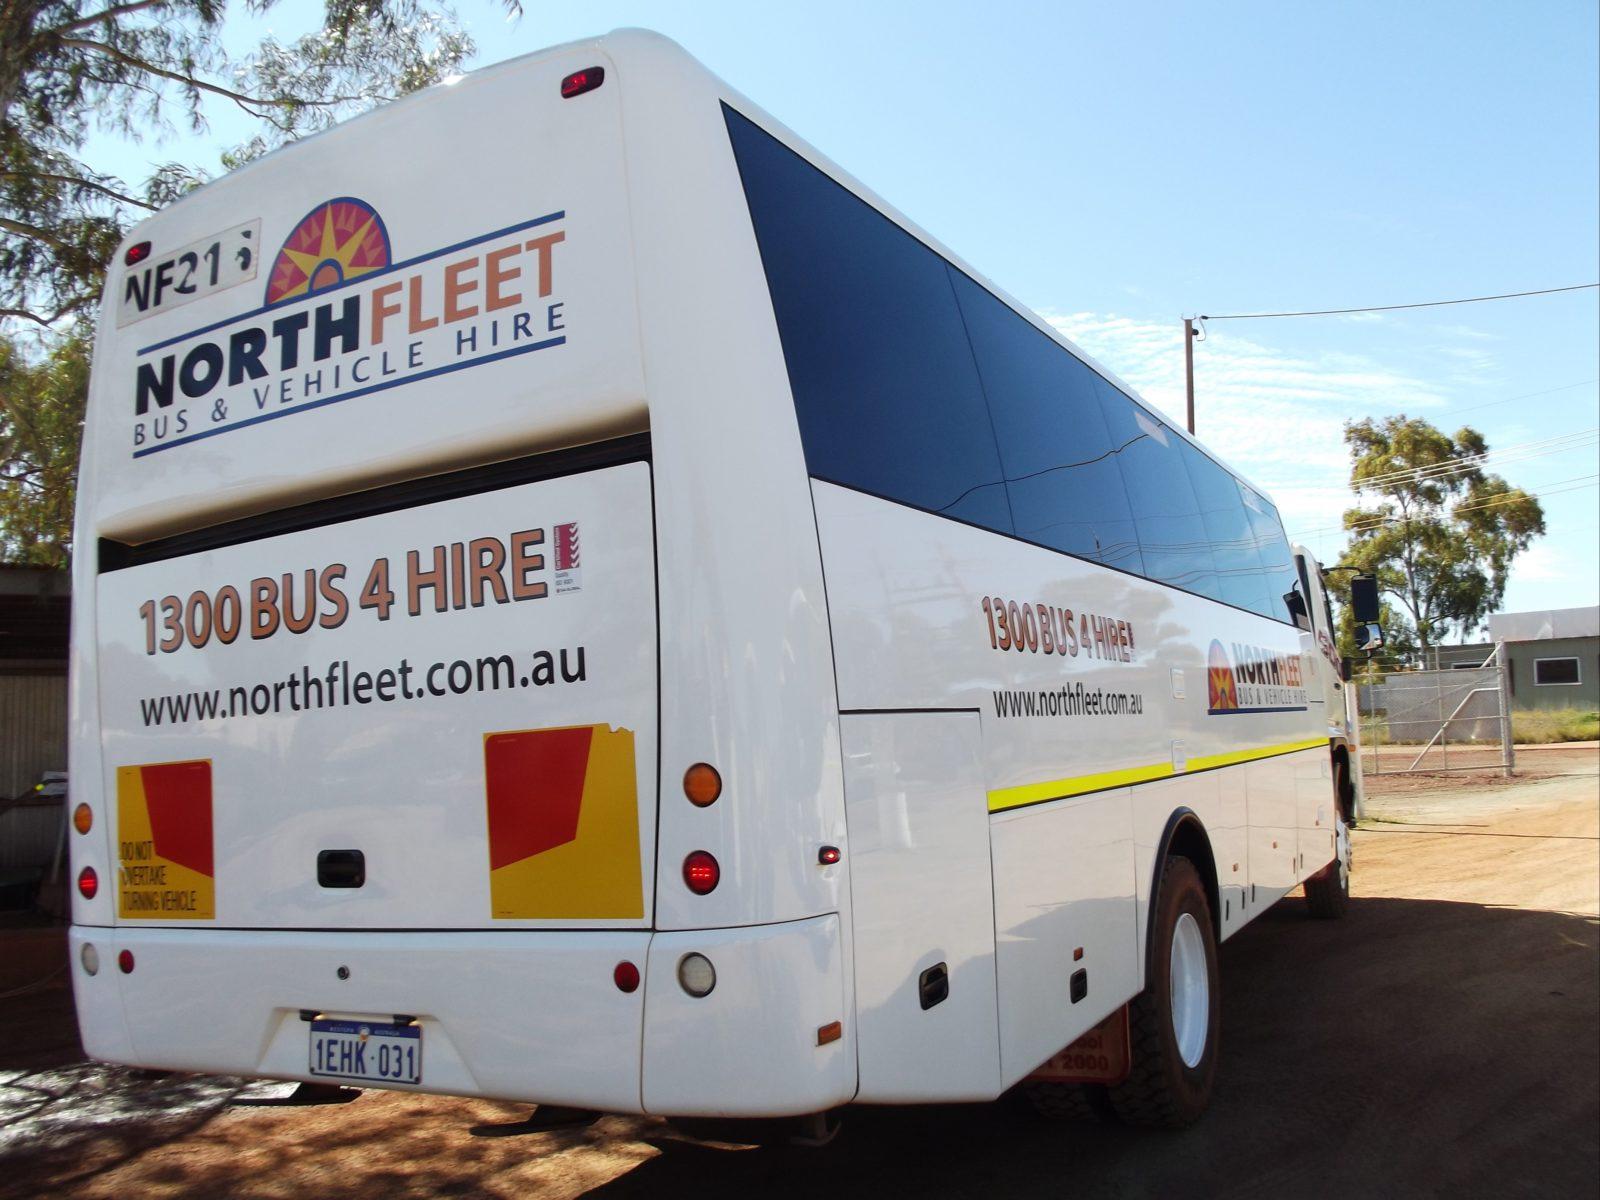 Northfleet Bus and Vehicle Hire, Osborne Park, Western Australia